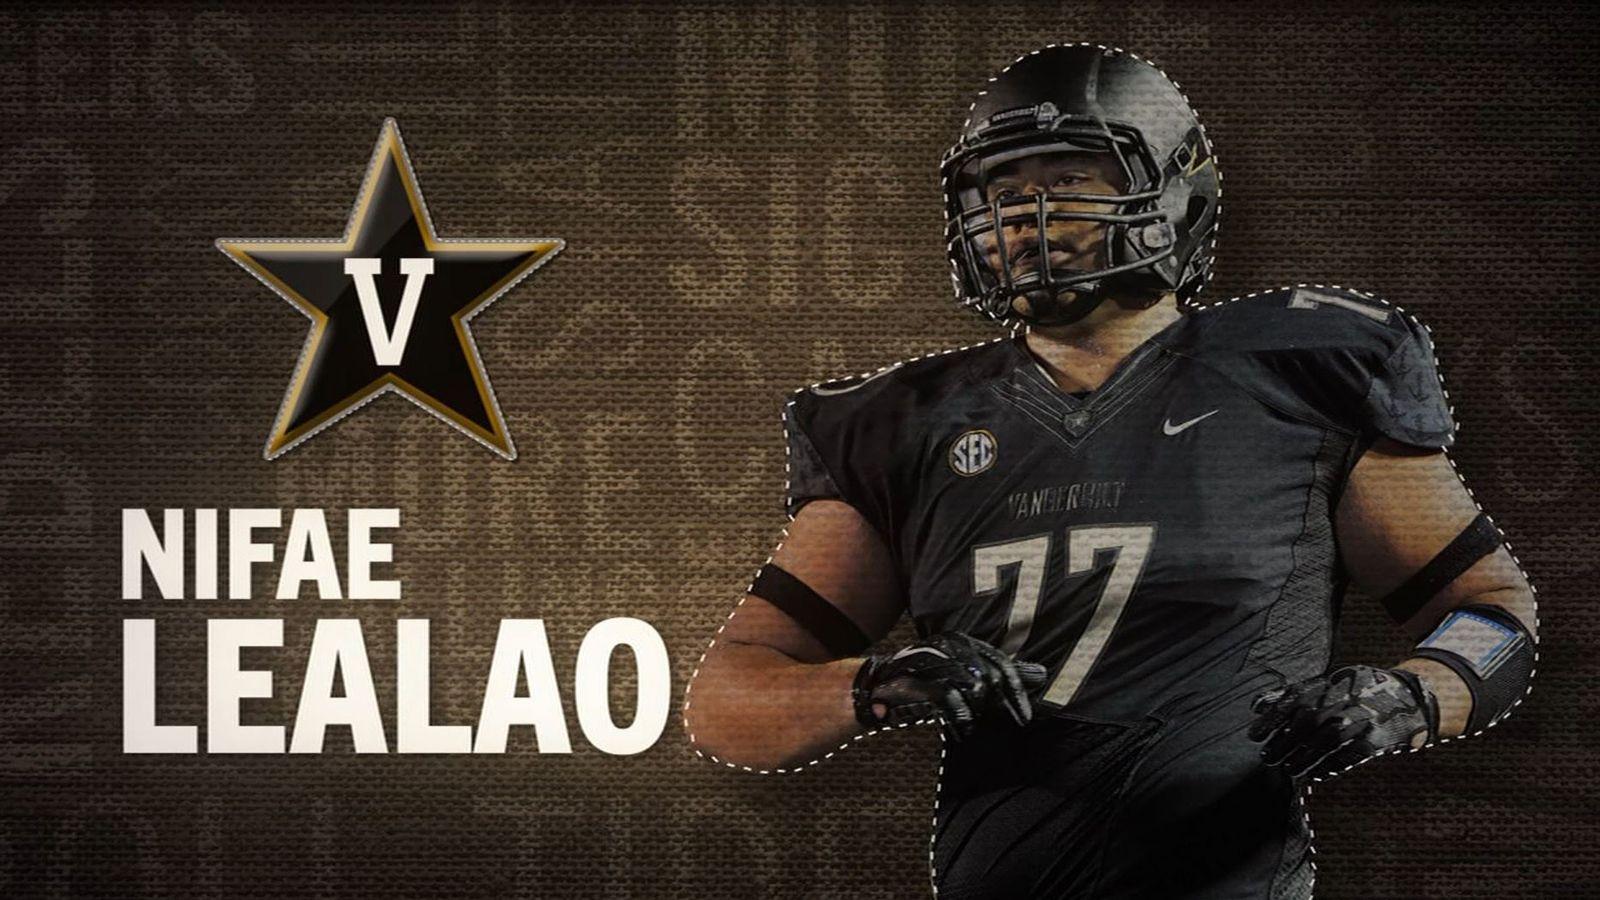 I am the SEC: Vanderbilt's Nifae Lealao